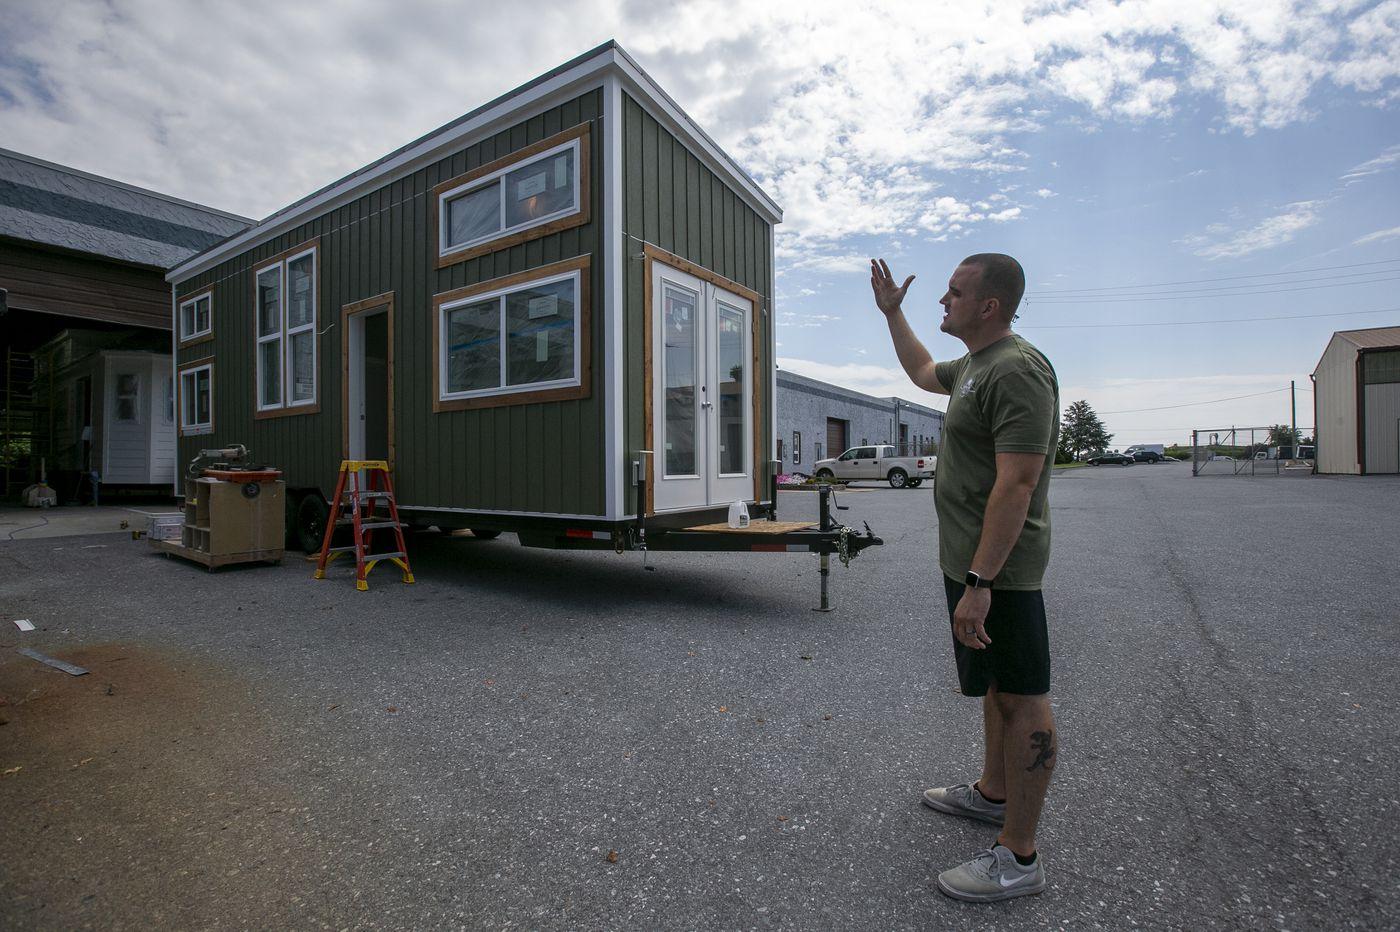 Villanova University Professor Works to Bring 'Tiny Homes' to Philadelphia Homeless